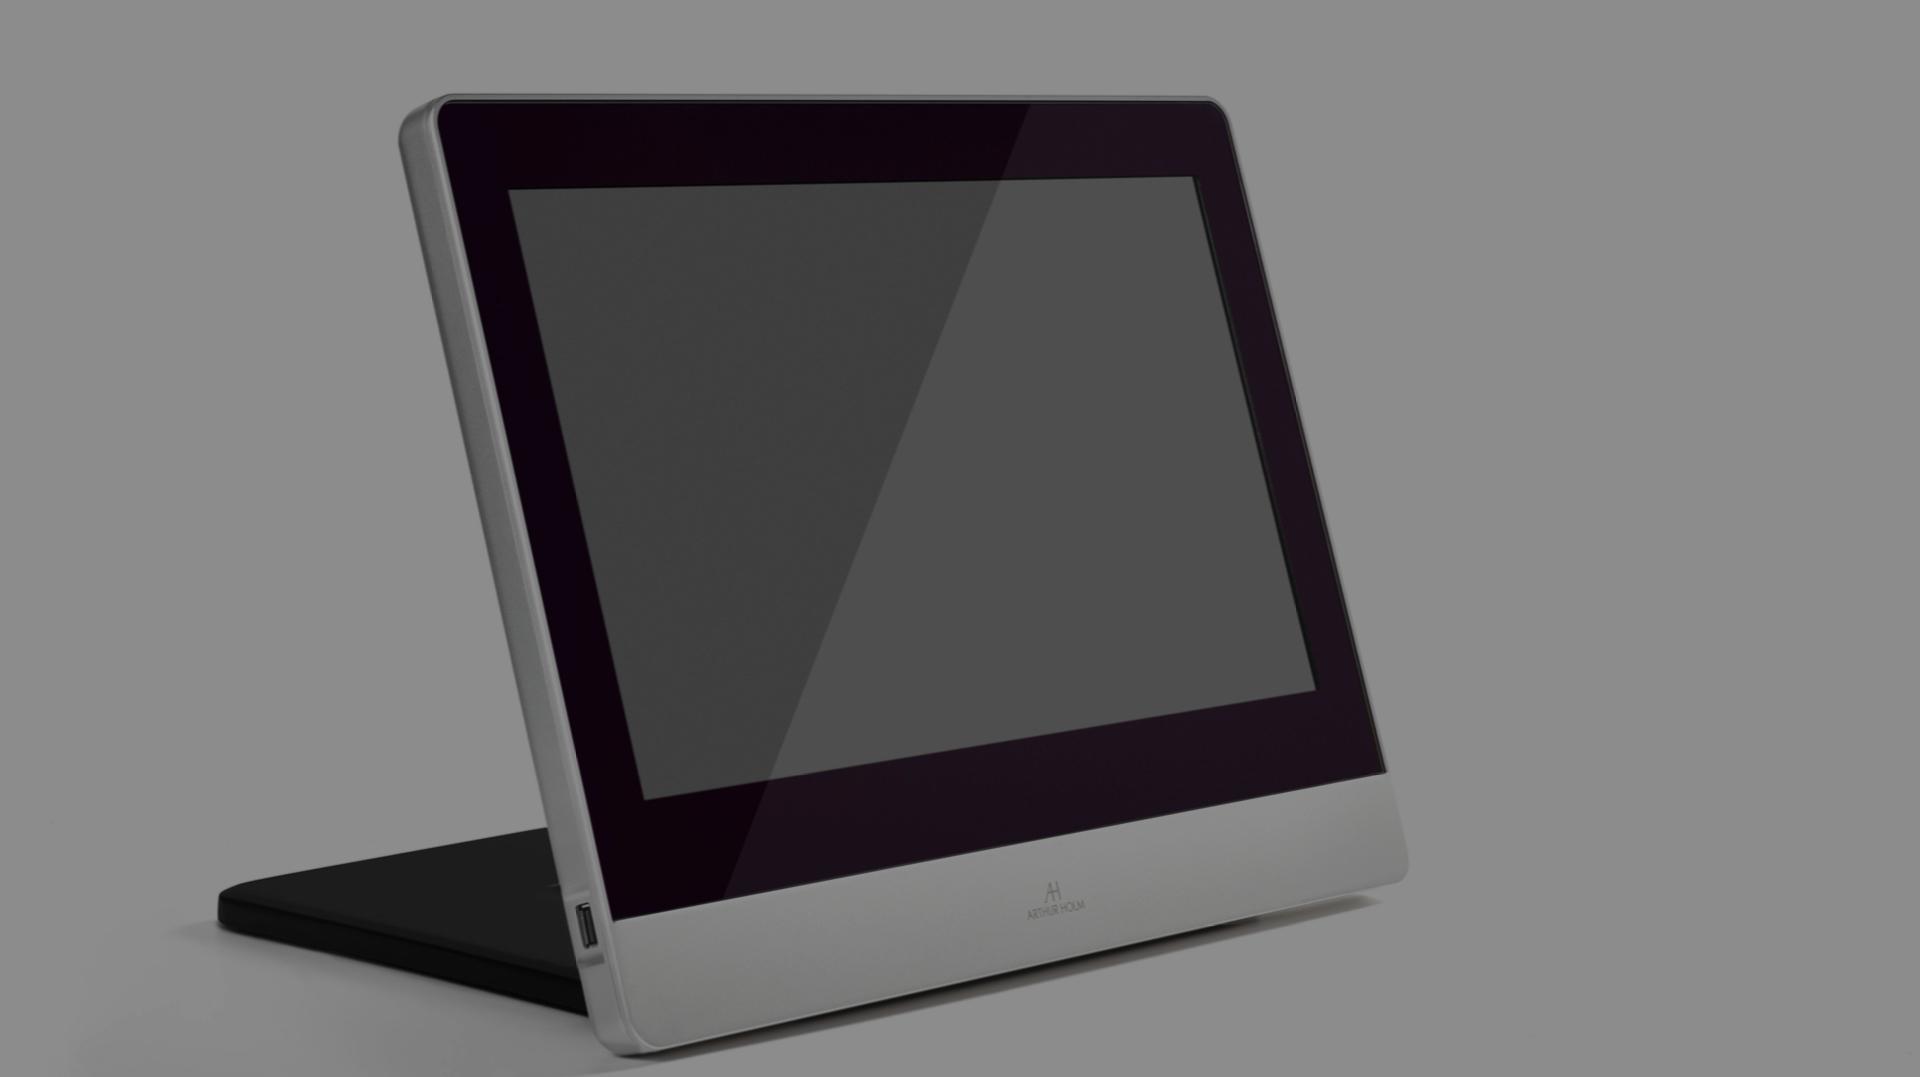 AH1 desktop monitor for meeting rooms